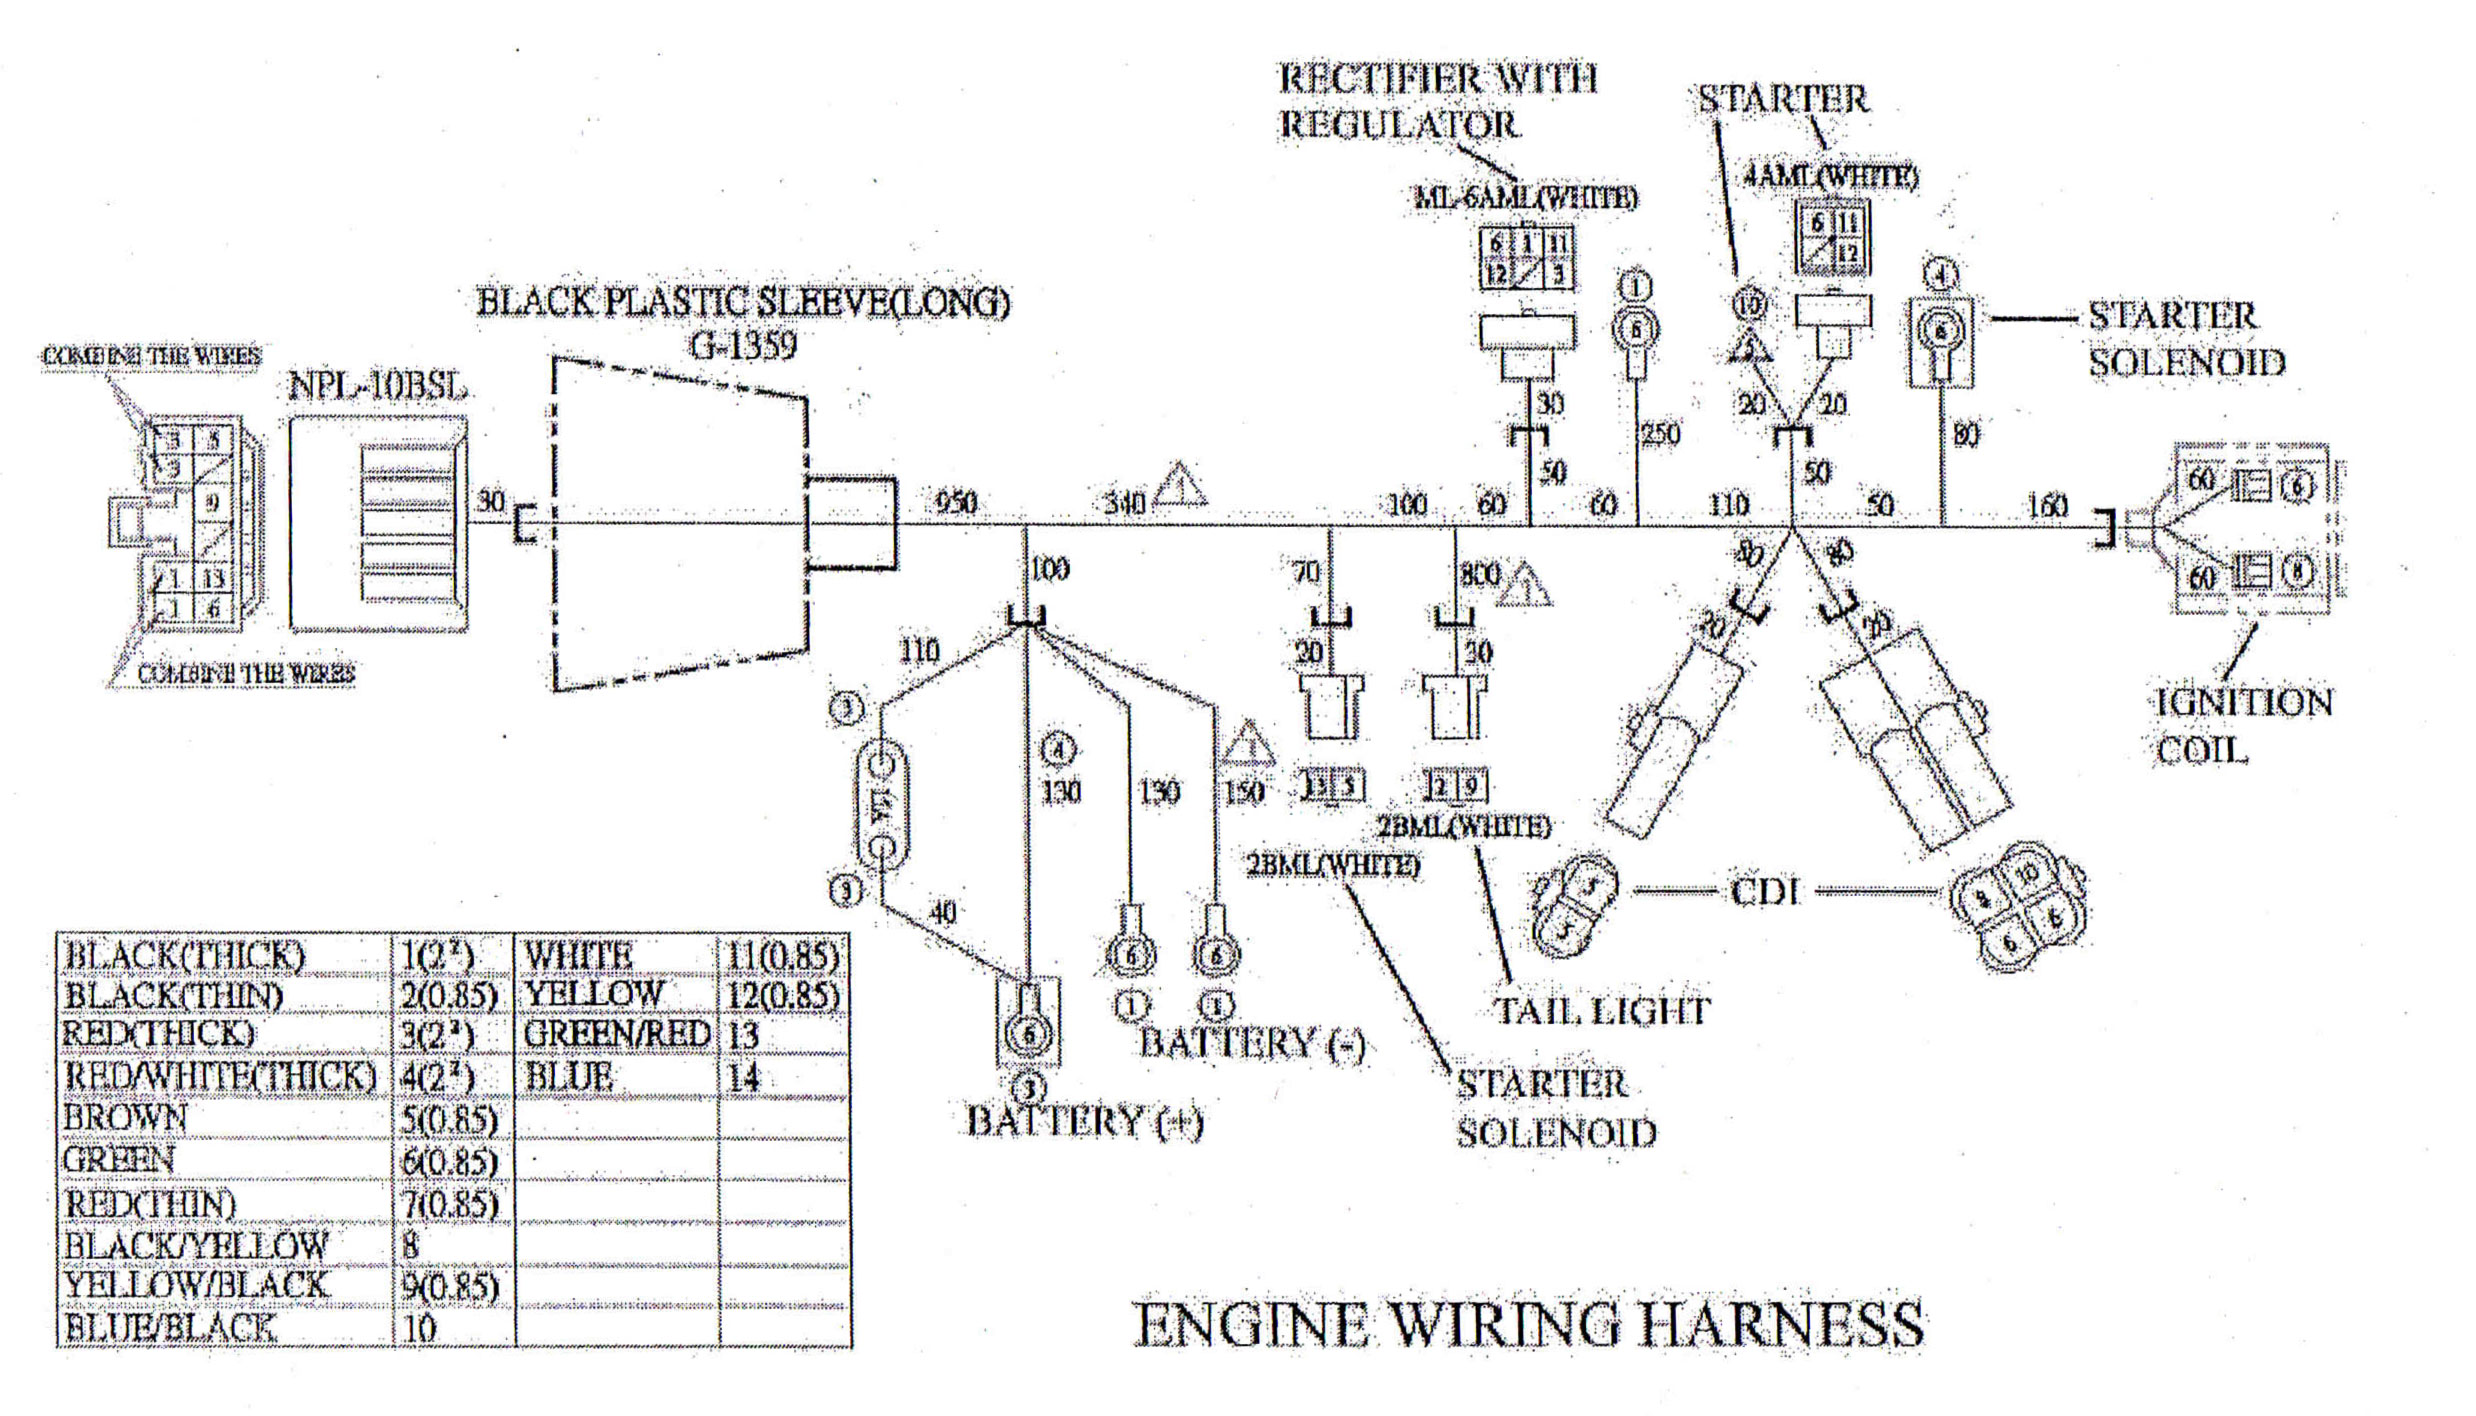 honda gx620 wiring schematic. Black Bedroom Furniture Sets. Home Design Ideas